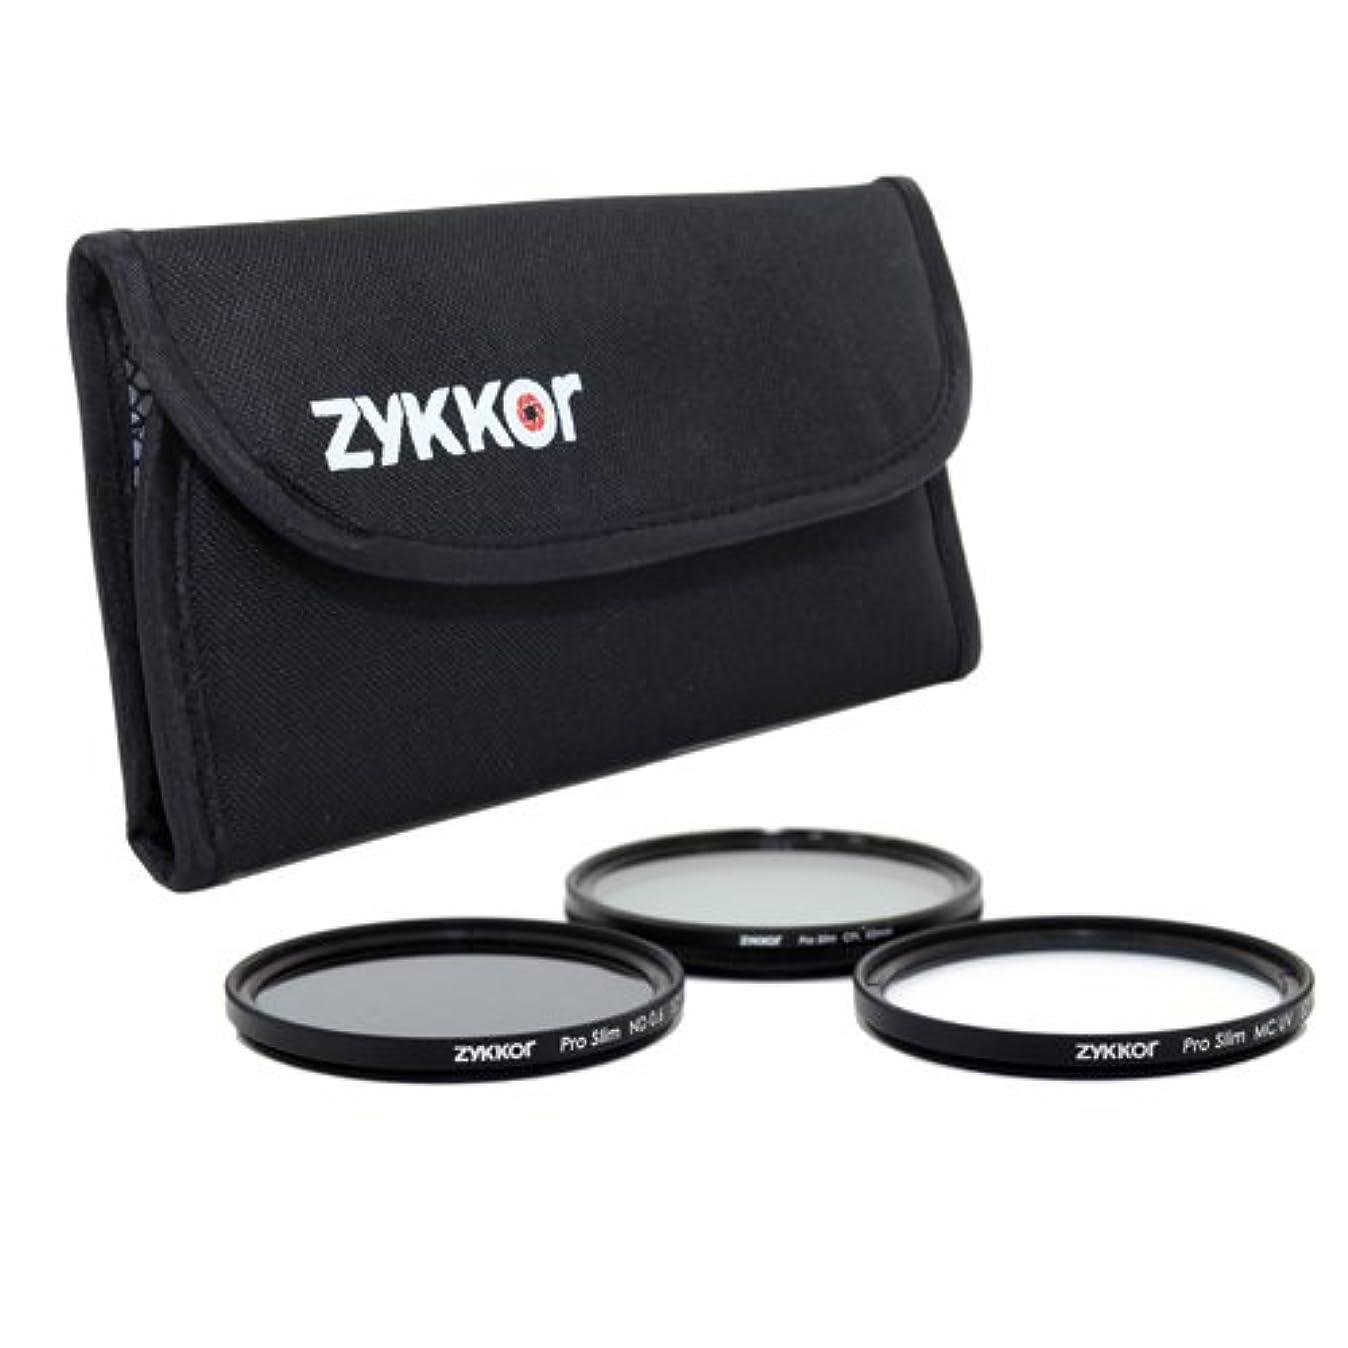 Zykkor 72mm Pro Slim CPL - MC UV - ND 0.6 Filter Kit with Deluxe Pouch bbtxhbktp